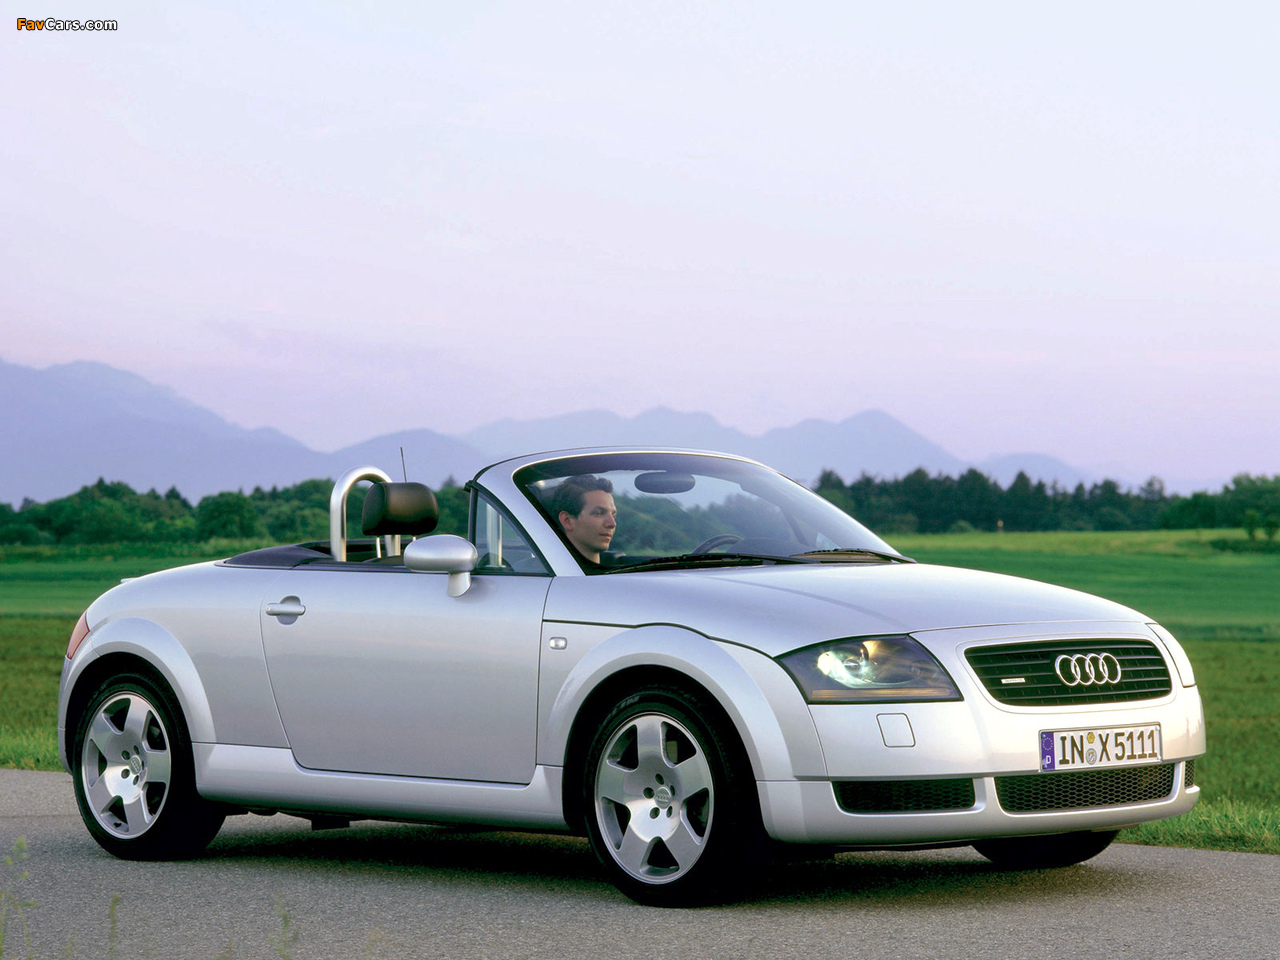 Audi Tt Roadster 8n 1999 2003 Pictures 1280x960